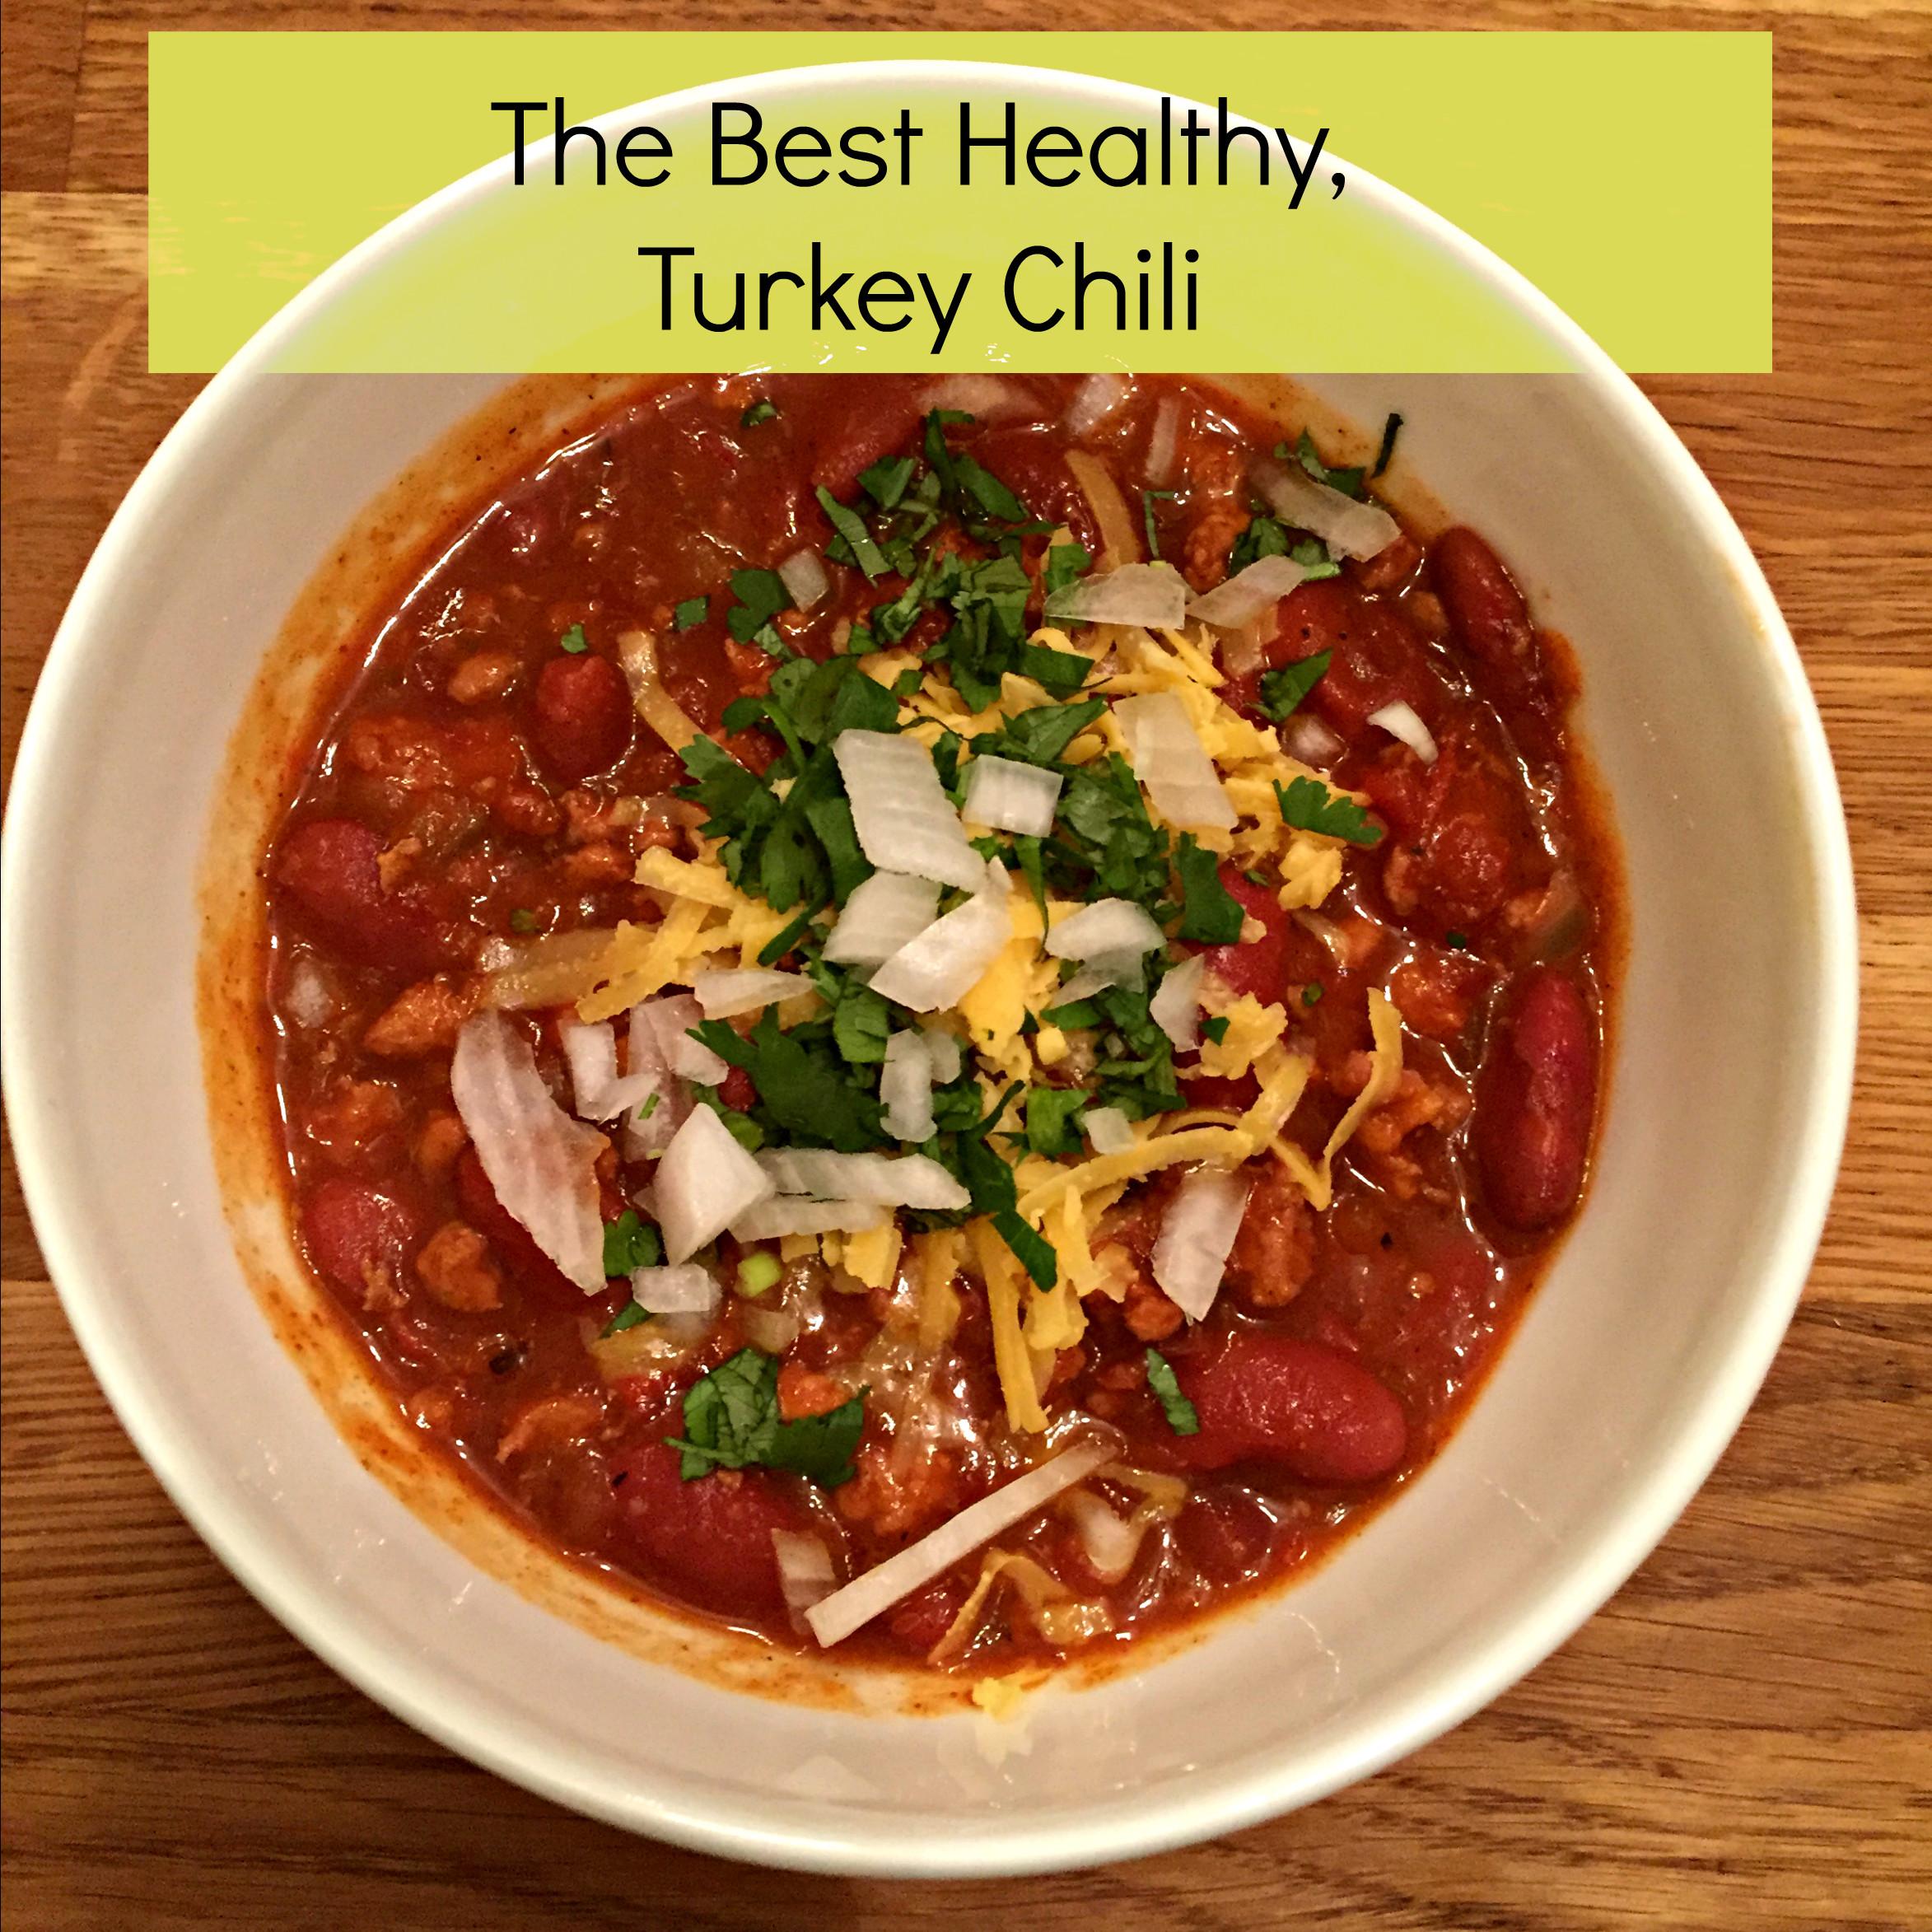 Turkey Chili Recipe  The Best Healthy Turkey Chili Recipe My Healthy Happier